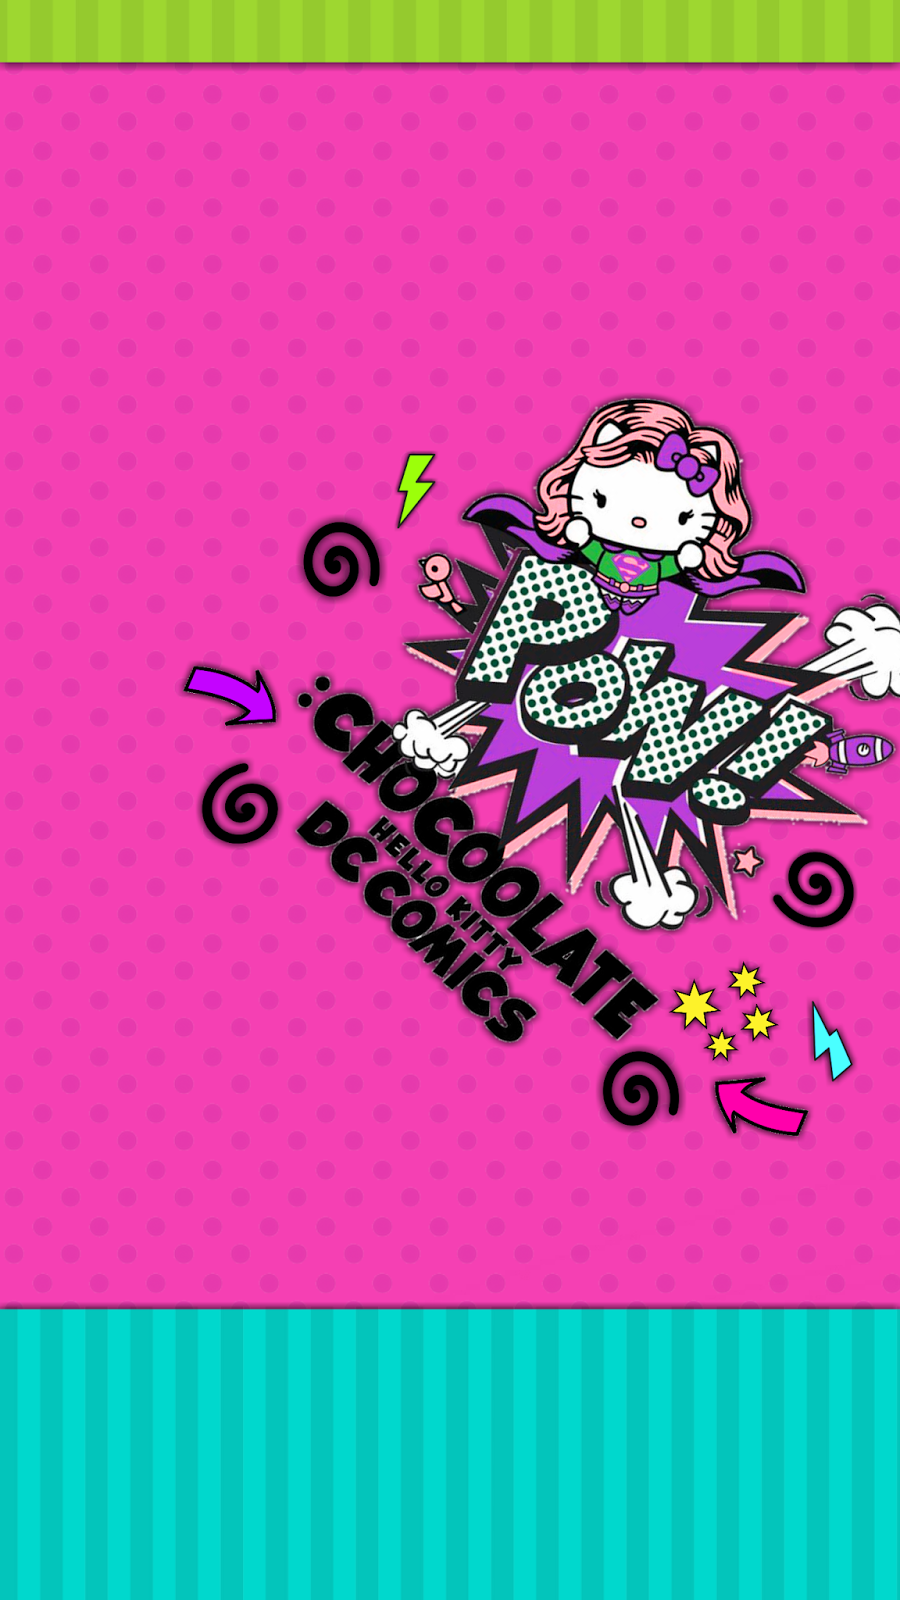 Popular Wallpaper Hello Kitty Vintage - 04cab1a215fb4f1b91af533529486b24  Image_80713.png